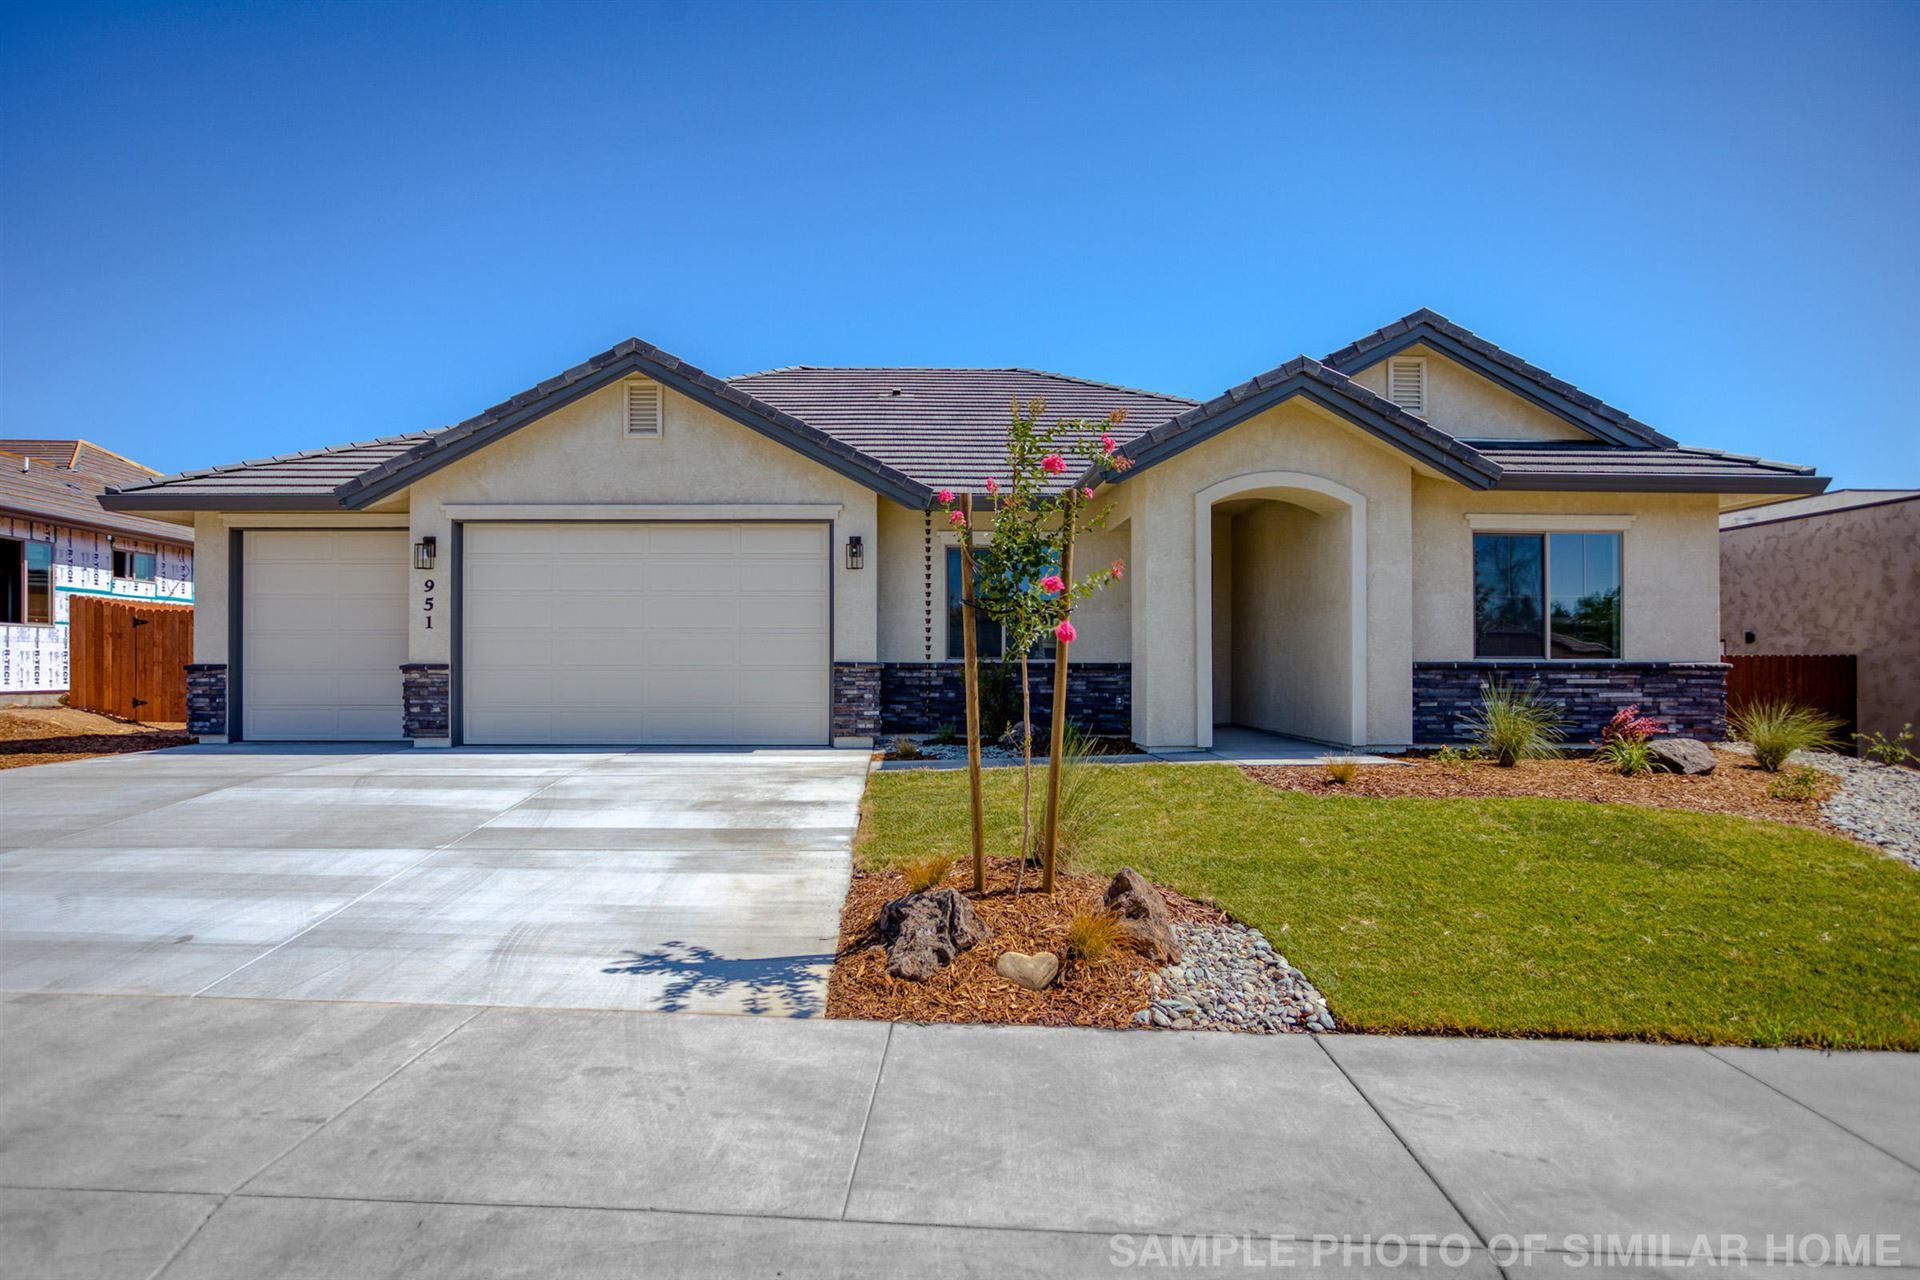 0000 Lower Springs Lot 14 Rd, Redding, CA 96001 - MLS#: 20-1942